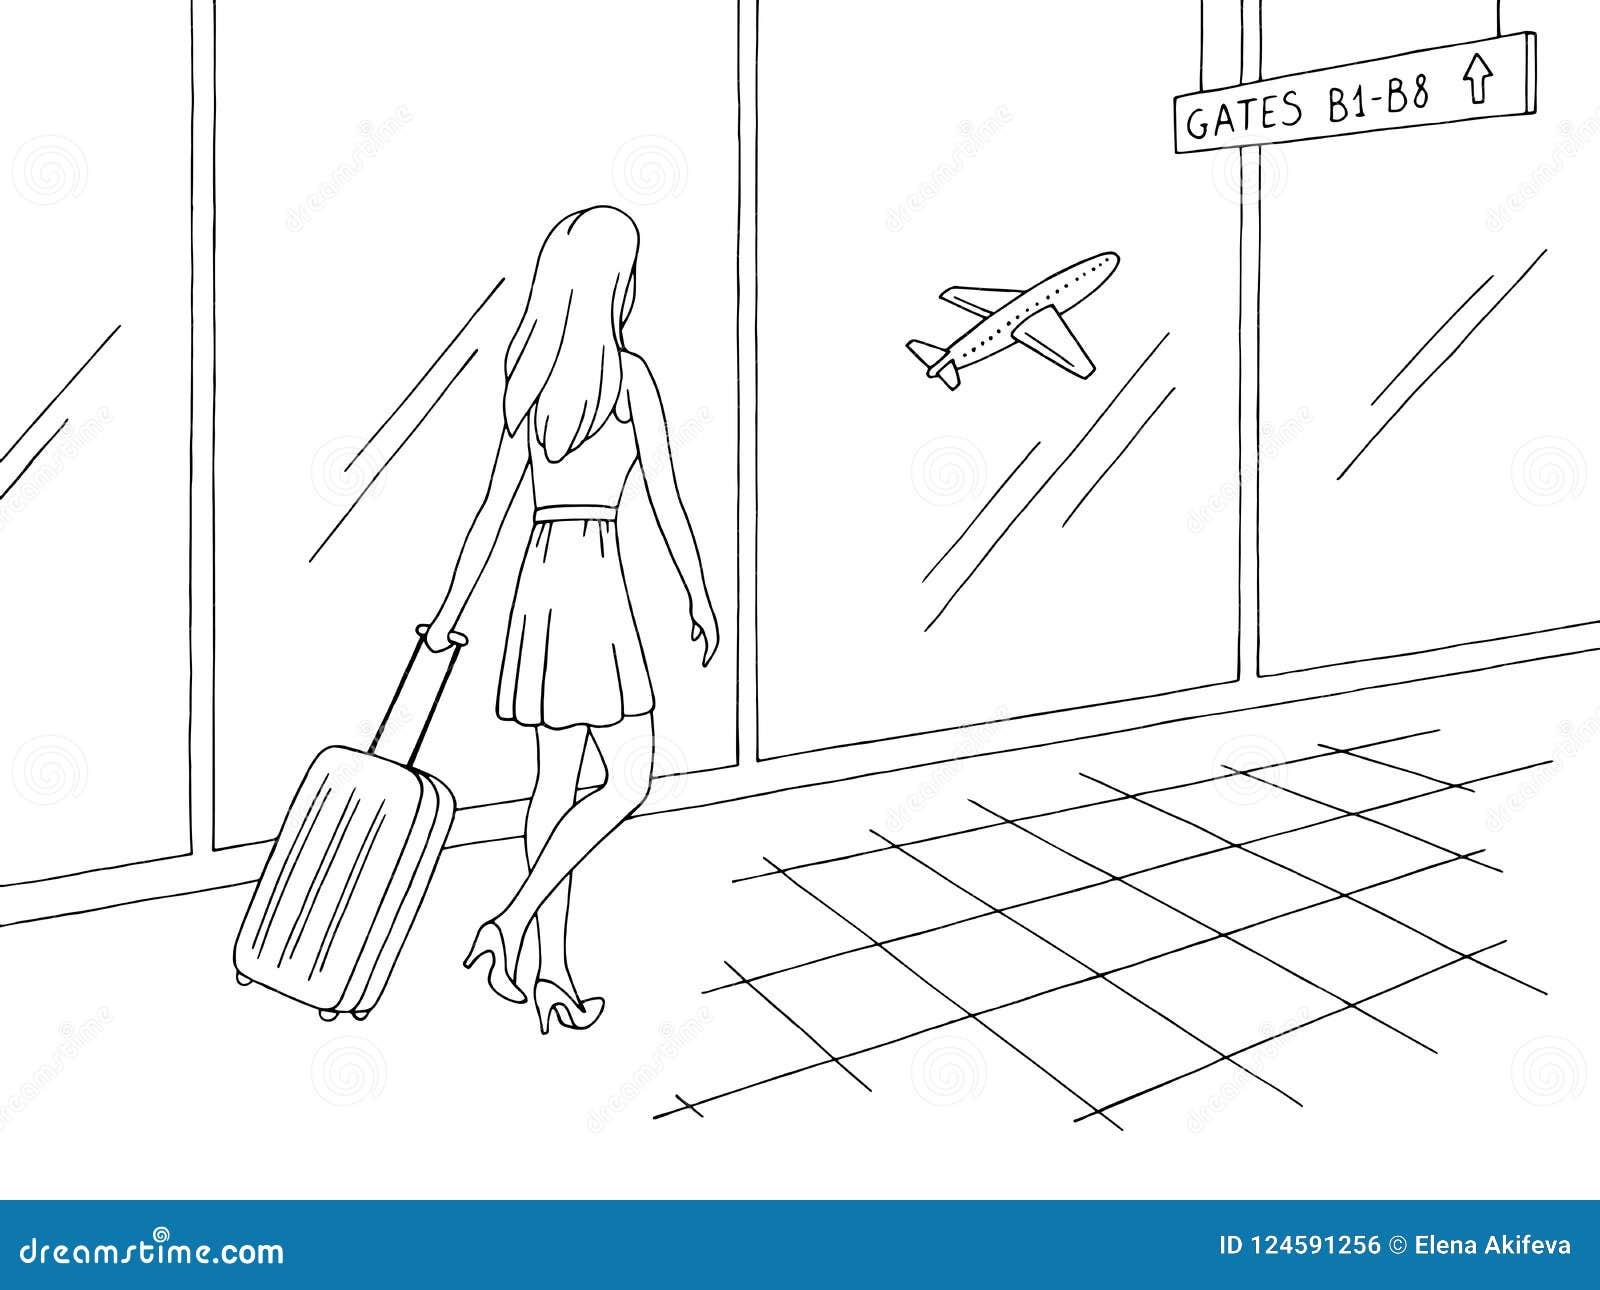 Airport Interior Graphic Black White Sketch Illustration Vector